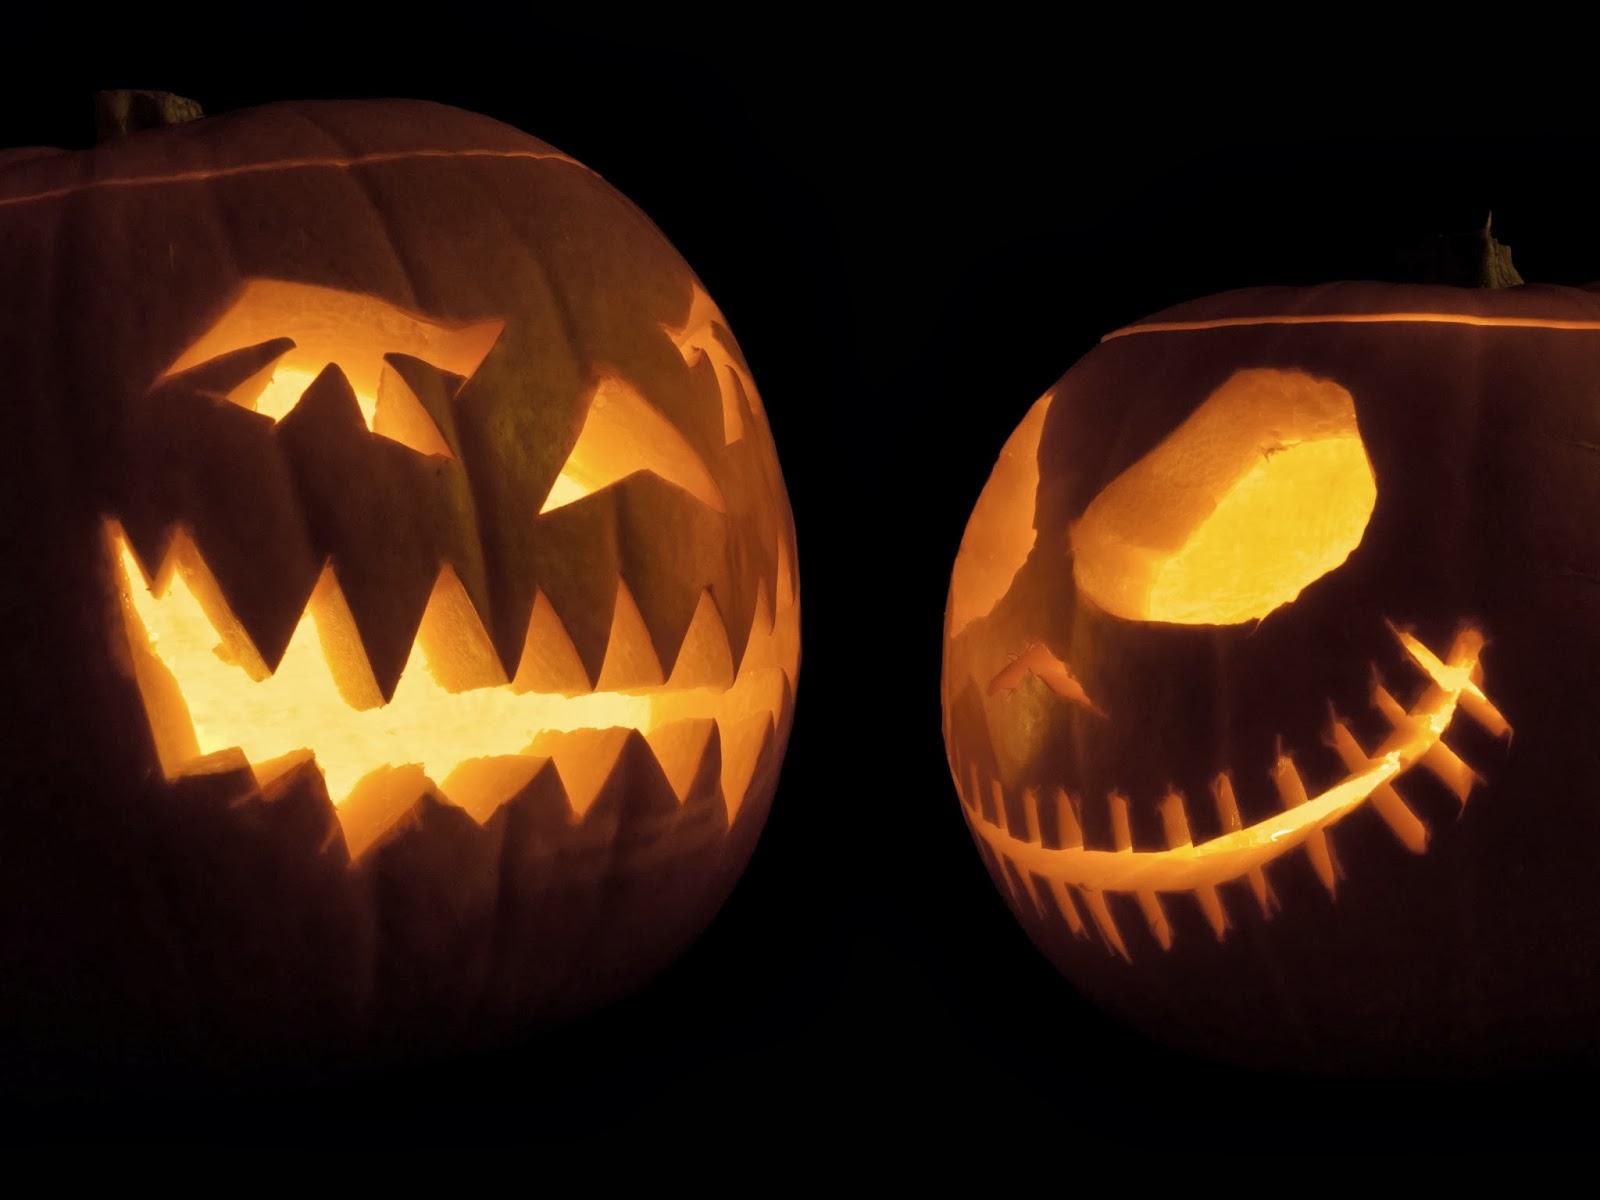 Grammazzle Truco Trato Trick Treat Calabaza Pumpkin Halloween